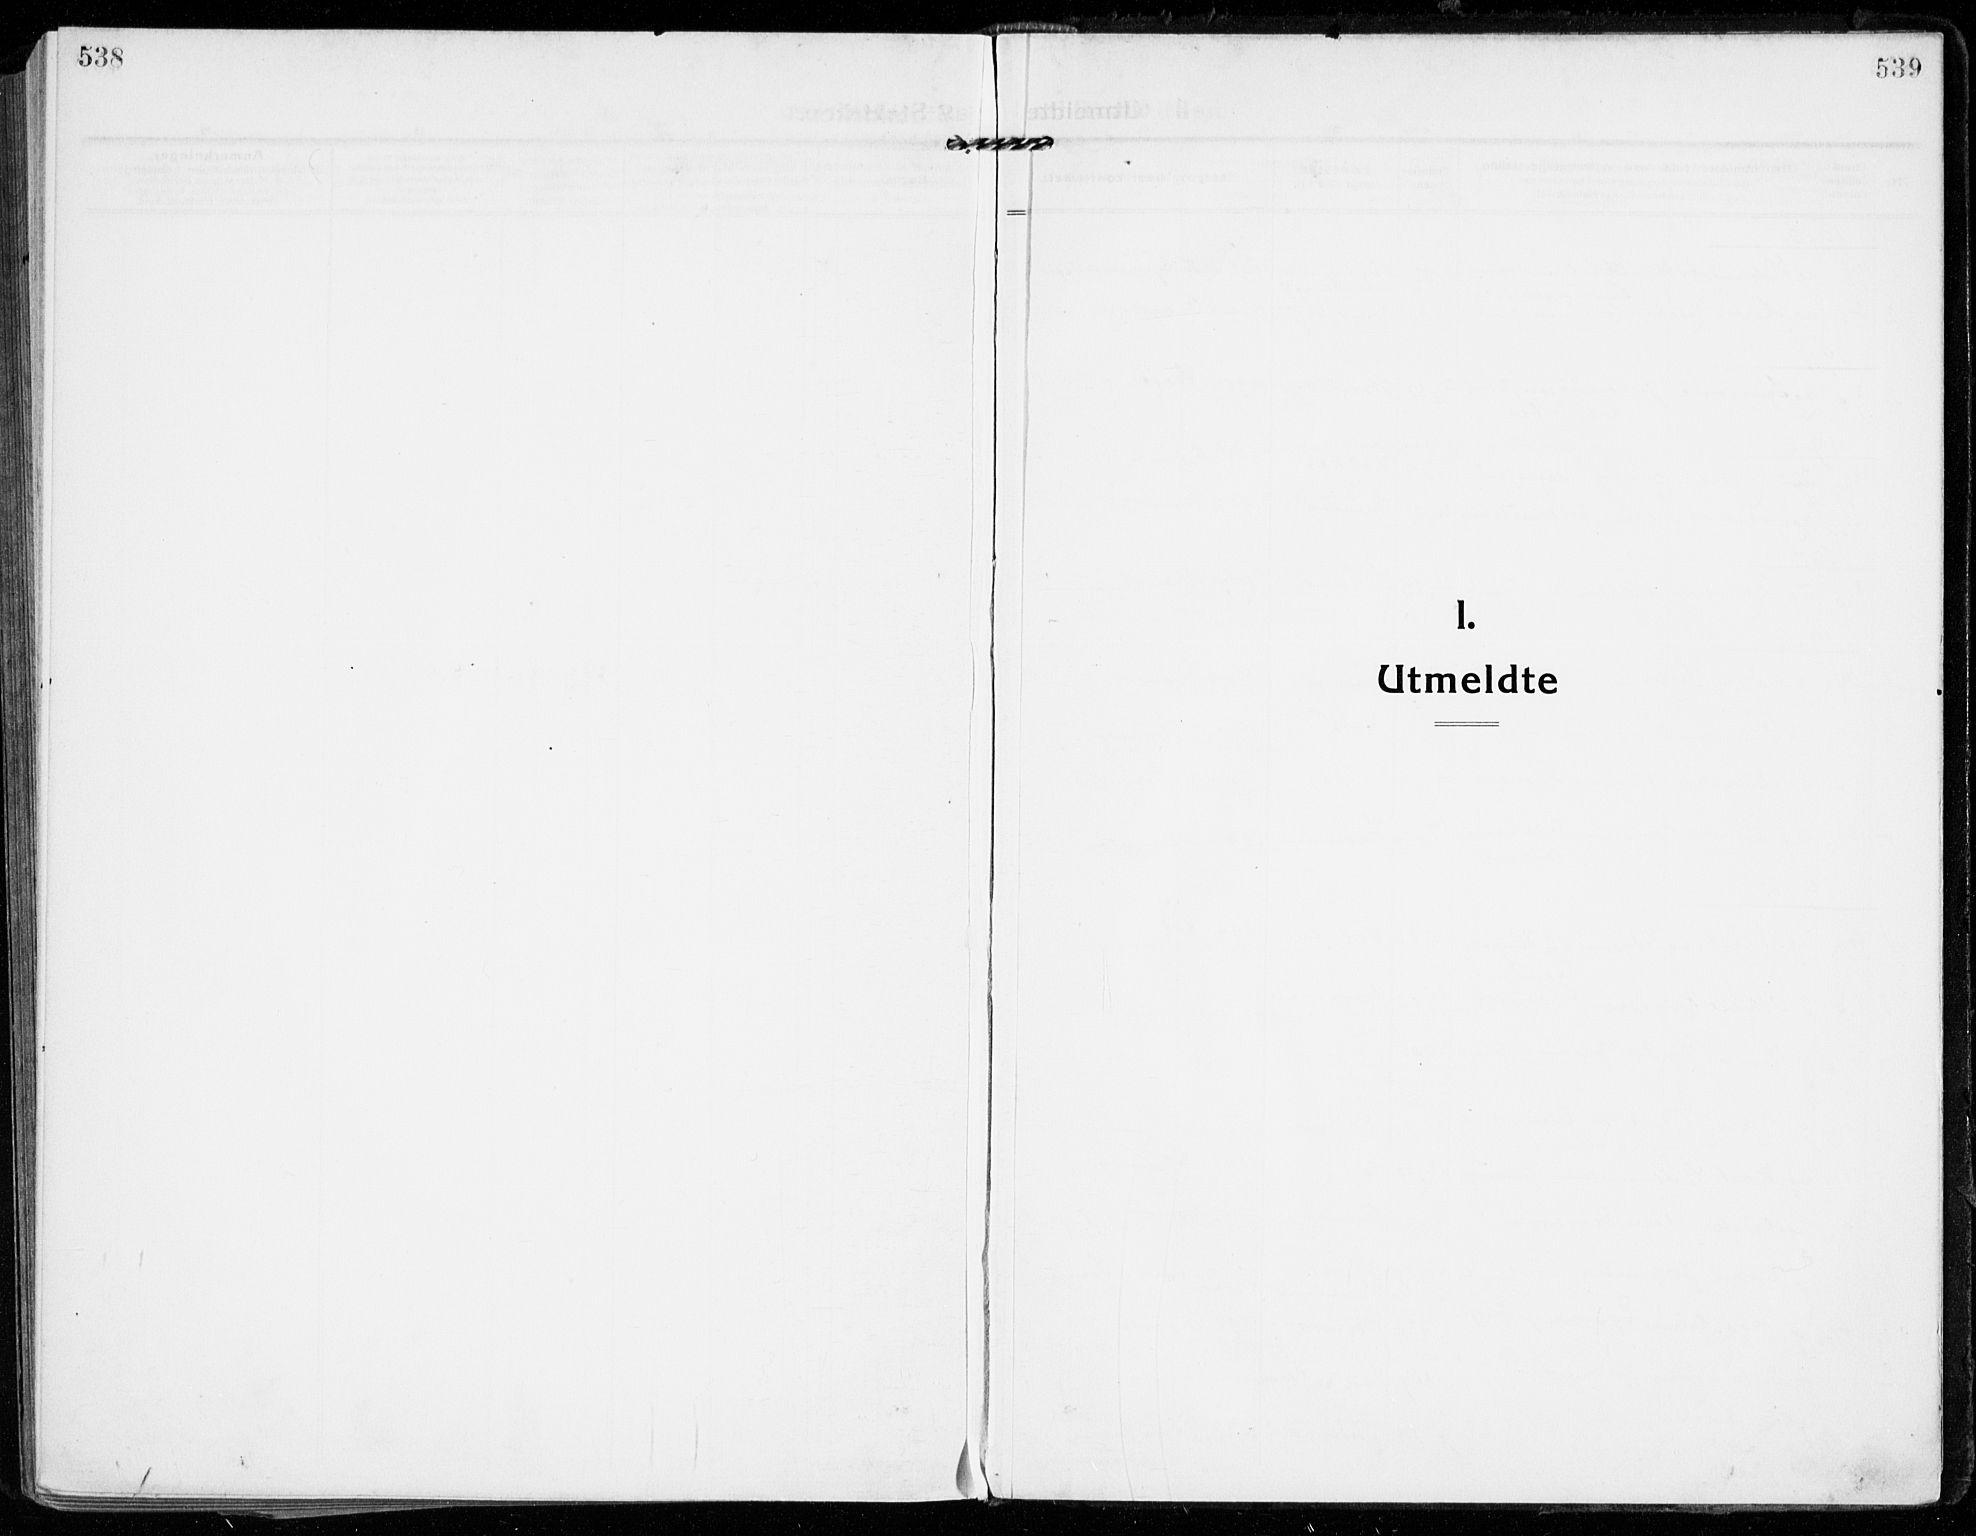 SAKO, Strømsgodset kirkebøker, F/Fa/L0002: Parish register (official) no. 2, 1910-1920, p. 538-539